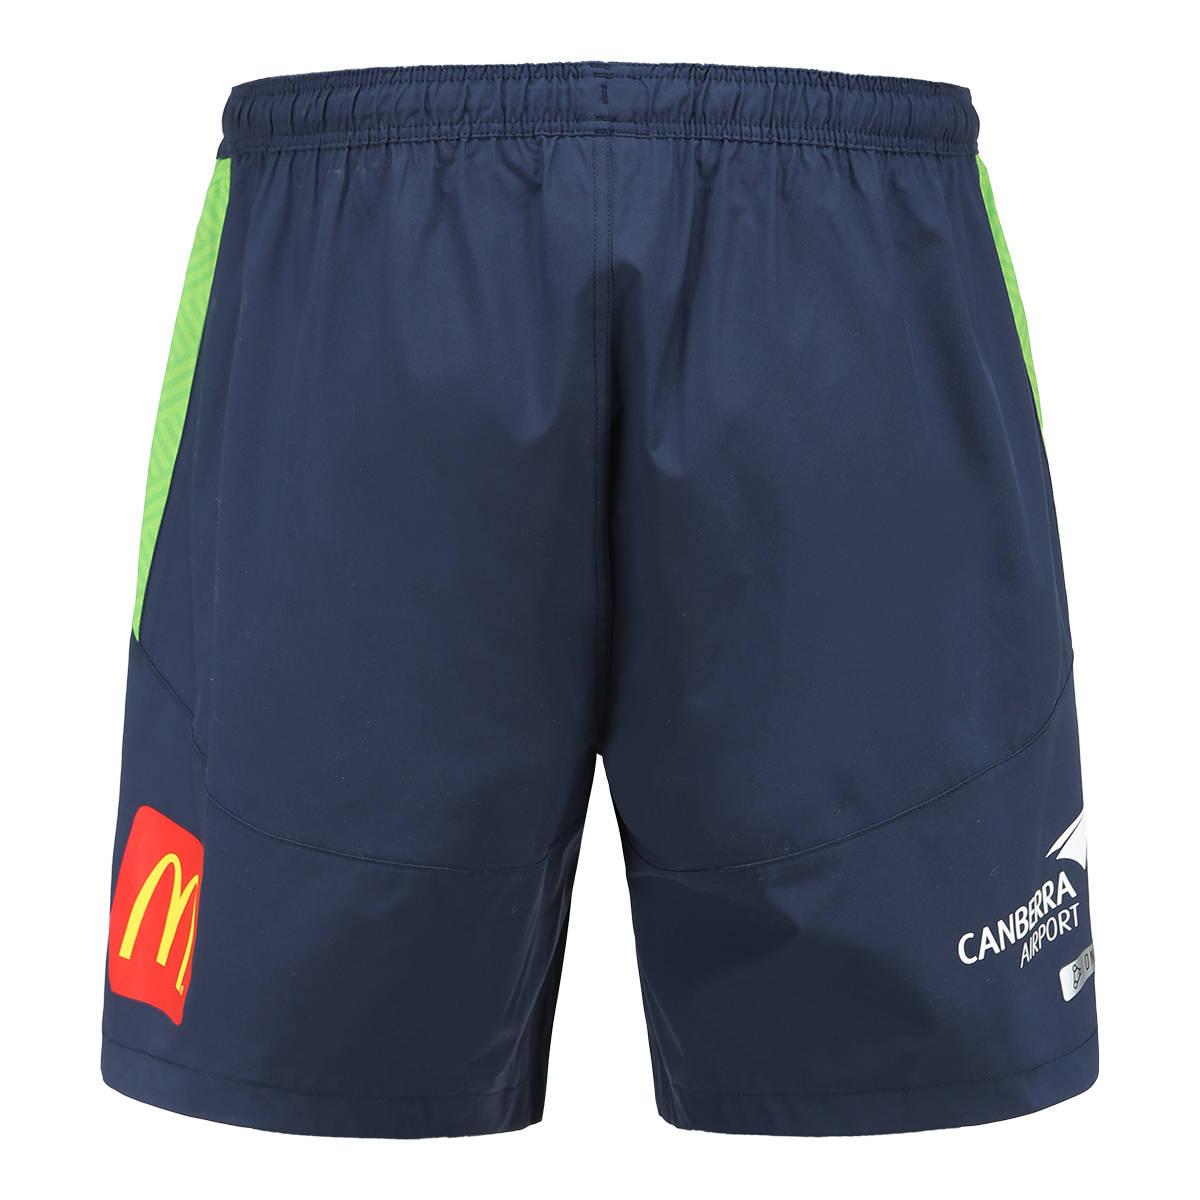 2021 Adults Training Shorts2